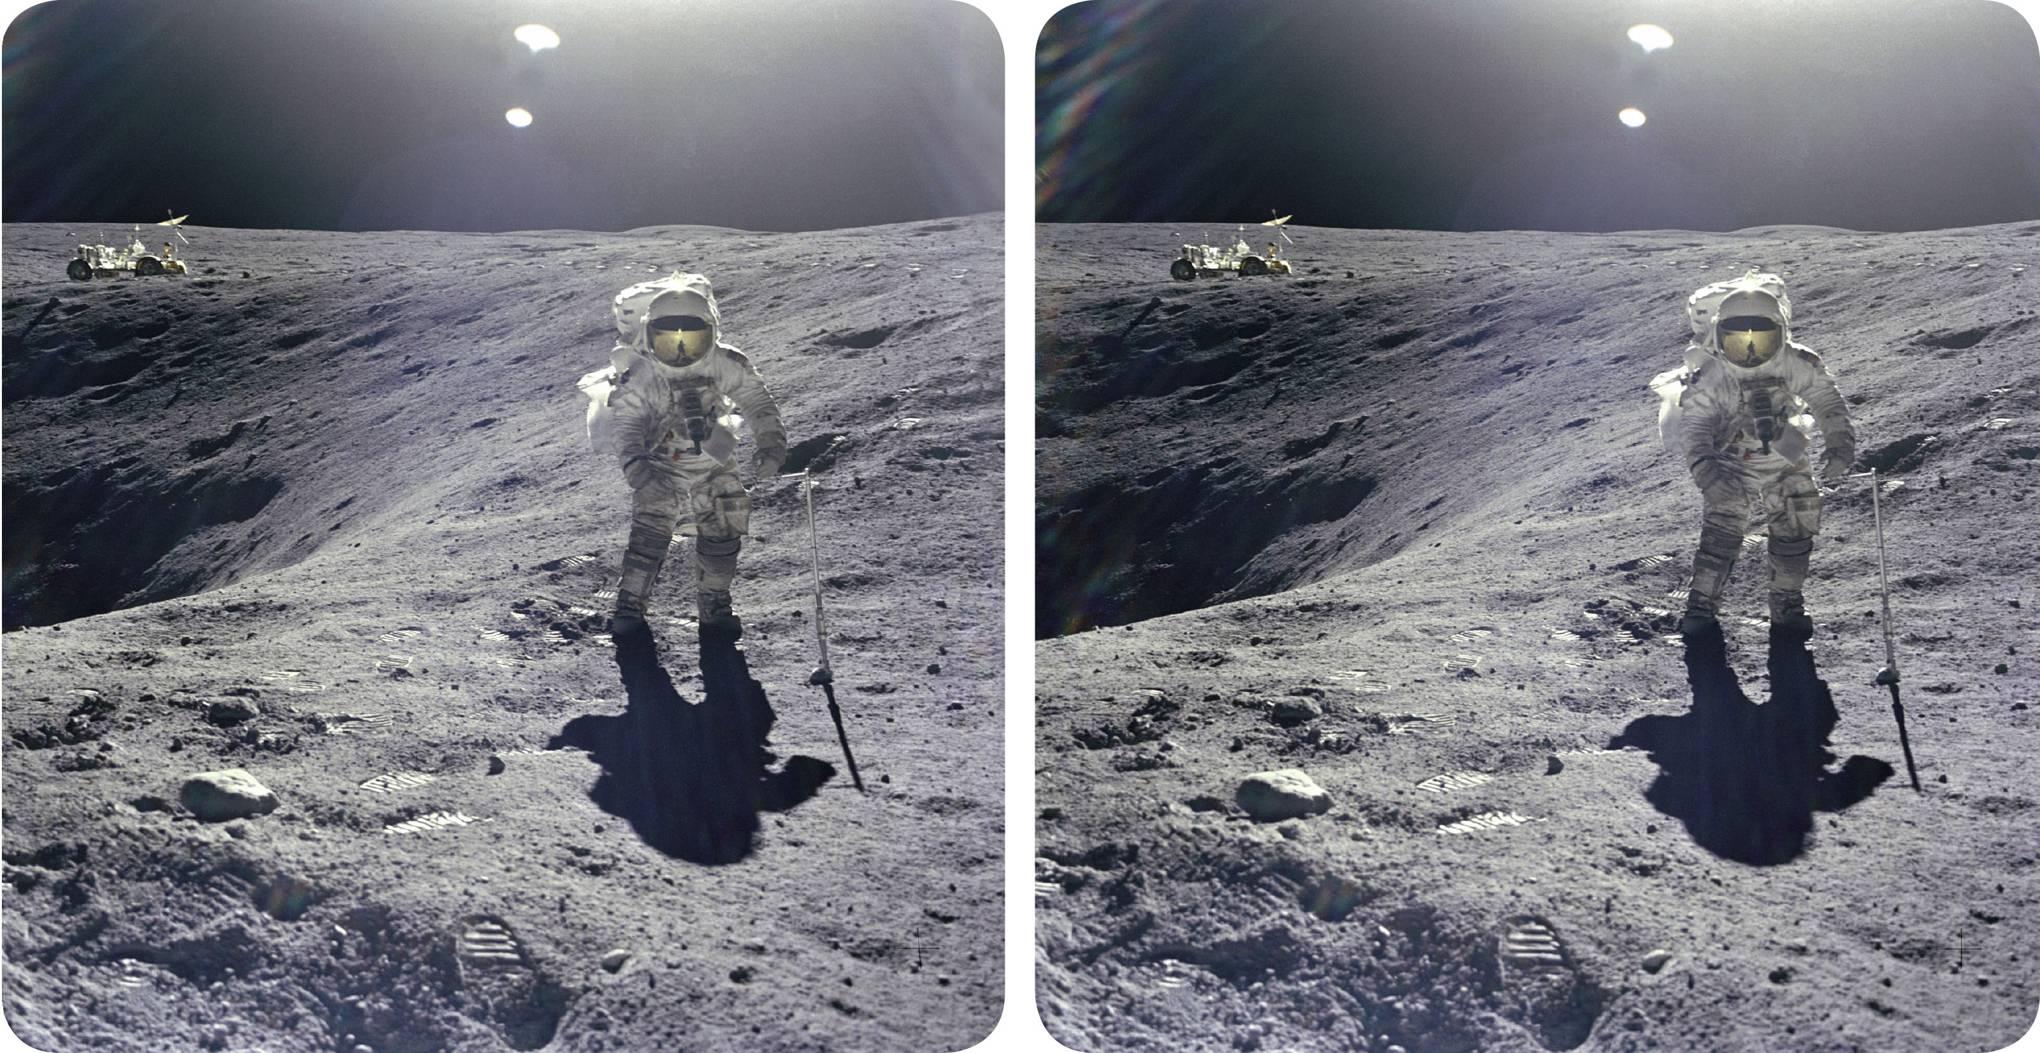 A risky moonshot